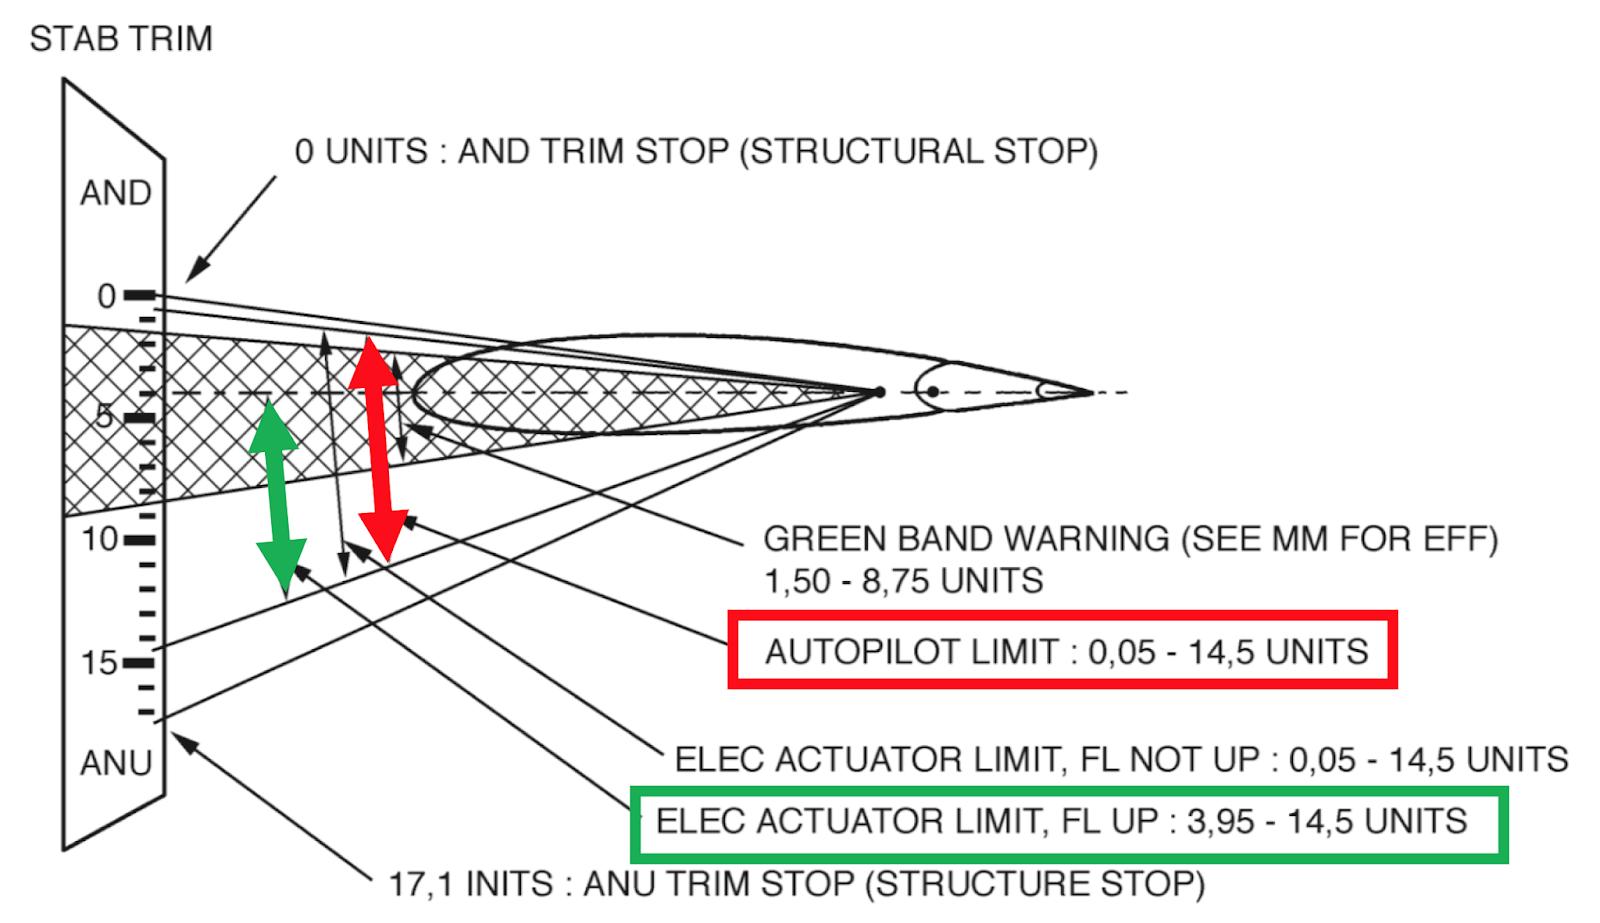 Satcom Guru: Trim Cutout with Severe Out-of-Trim Stabilizer